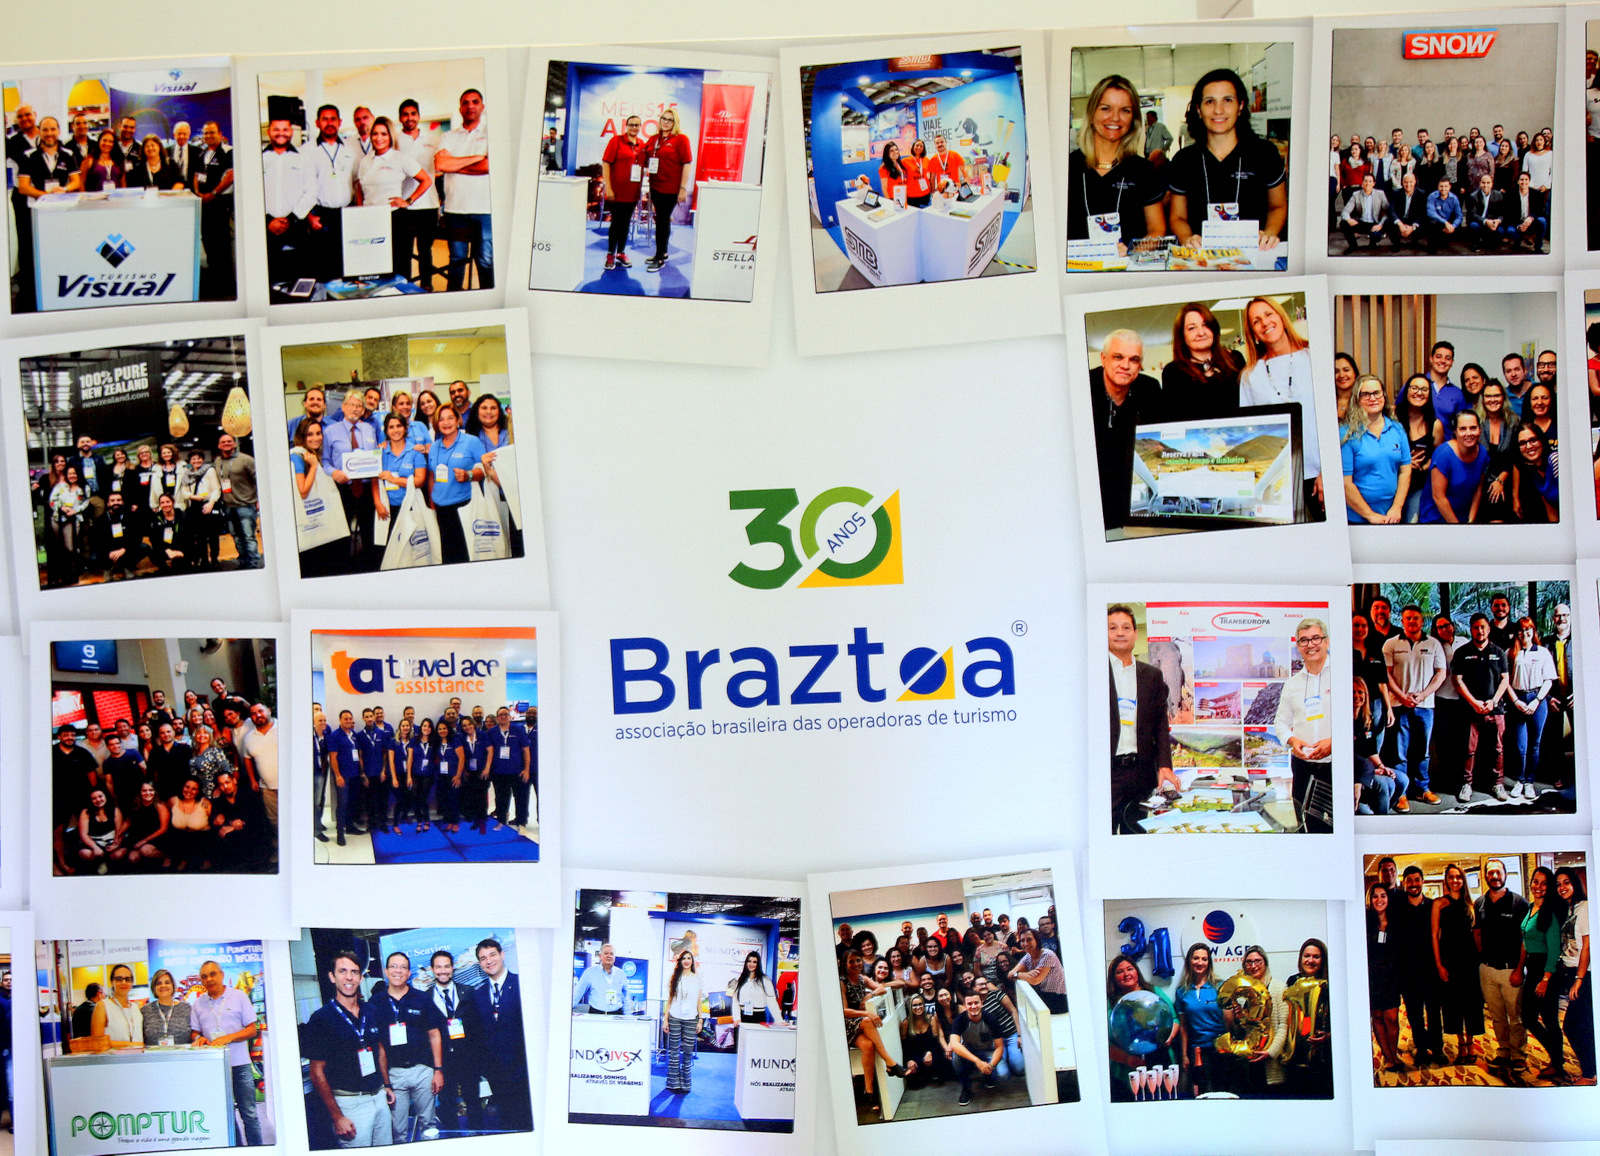 Anuário Braztoa - turismoonline.net.br